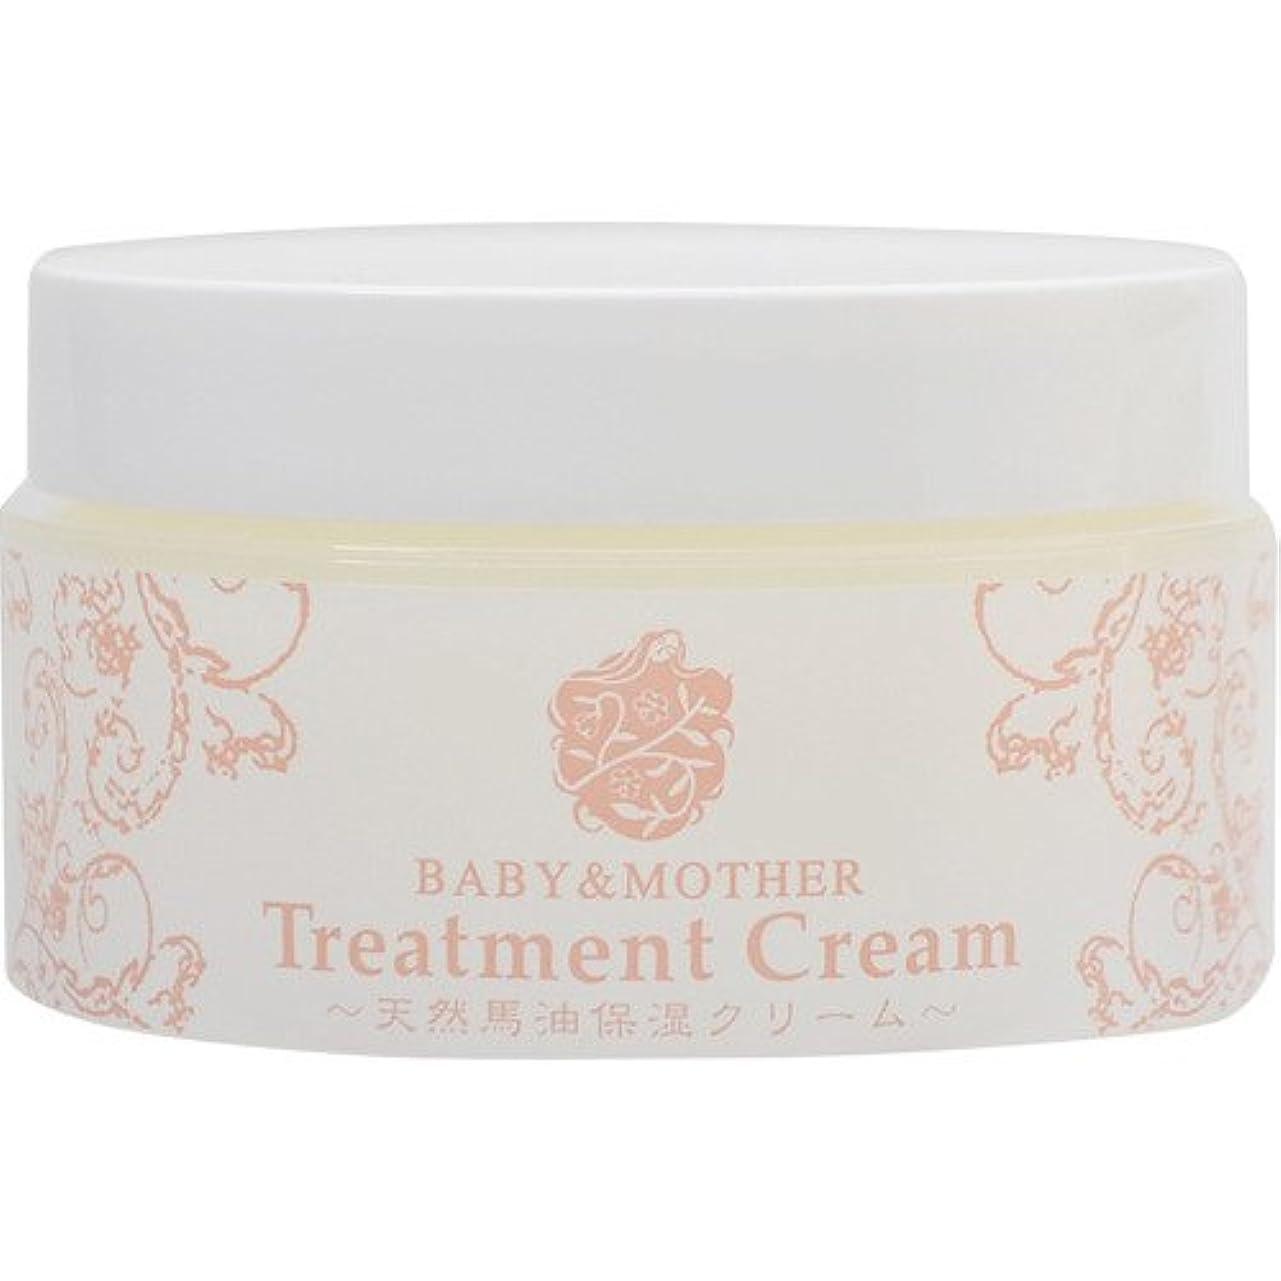 BABY&MOTHER Treatment Cream 天然馬油保湿クリーム 80g